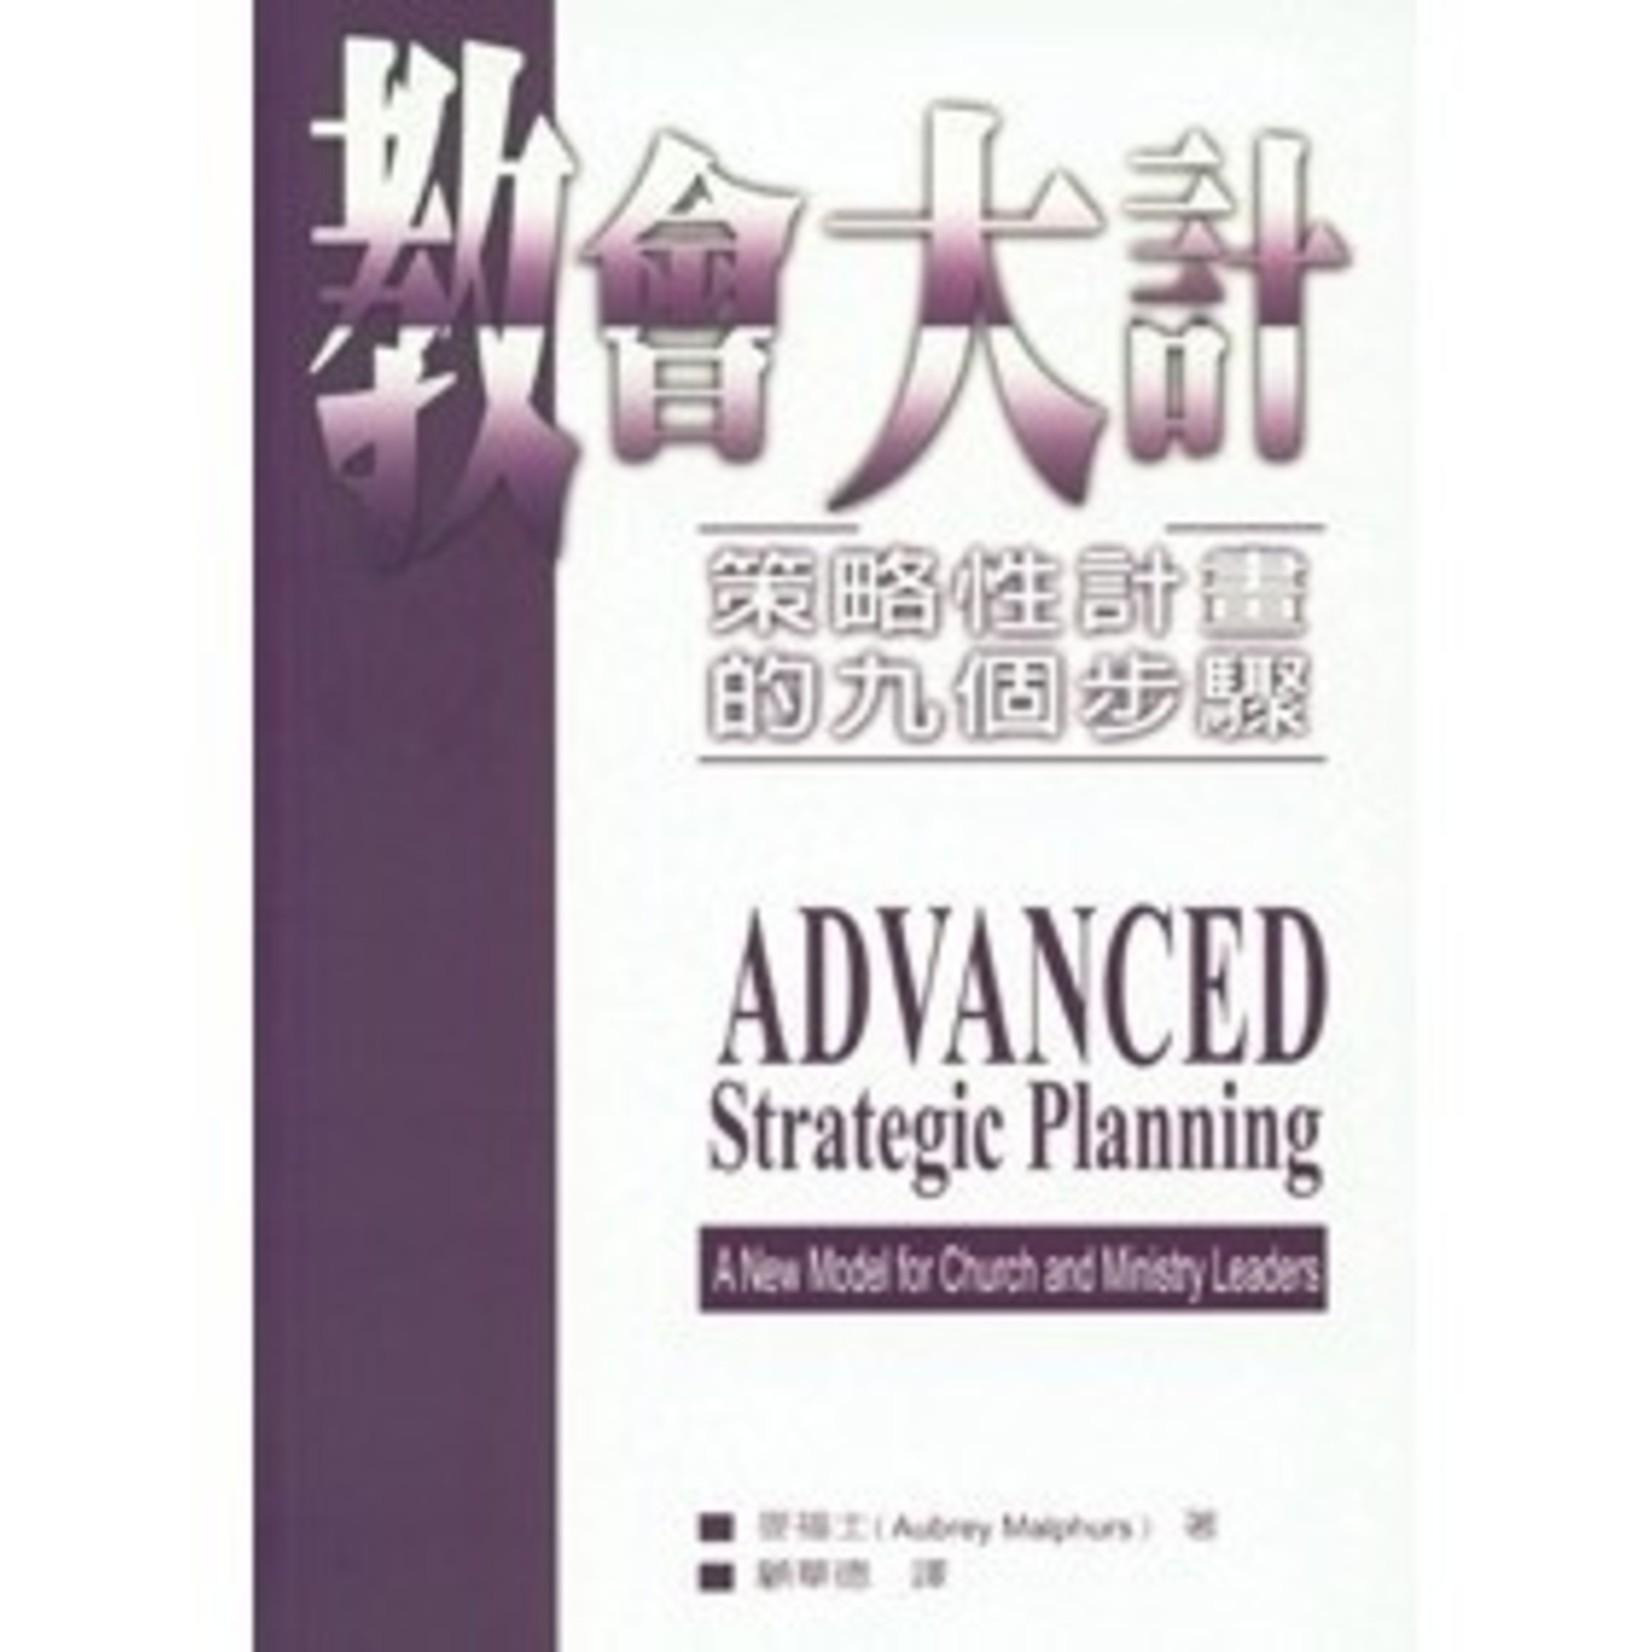 中華福音神學院 China Evangelical Seminary 教會大計:策略性計畫的九個步驟 Advanced Strategic Planning--A New Model for Church and Ministry Leaders